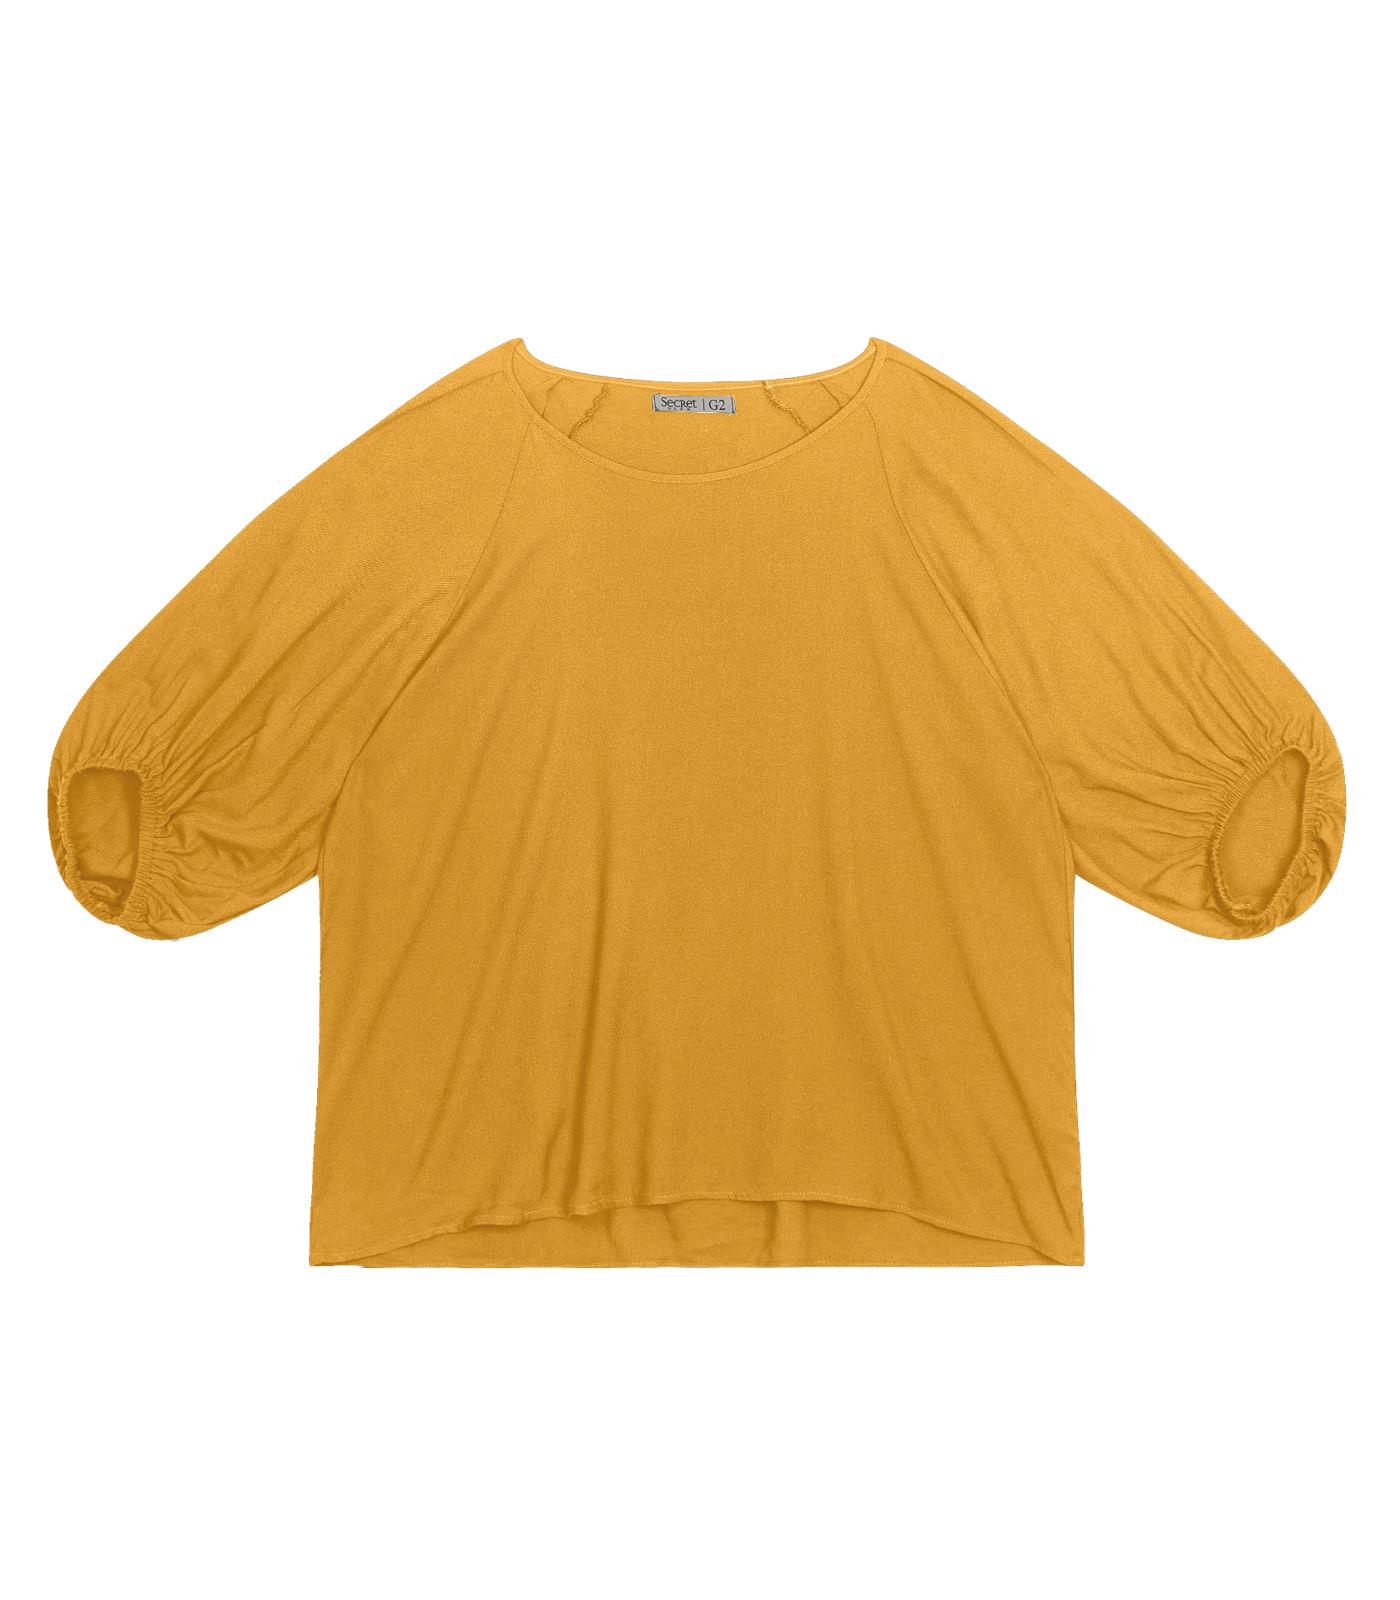 Blusa-Feminina-Plus-Size-Manga-Bufante-Secret-Glam-Amarelo